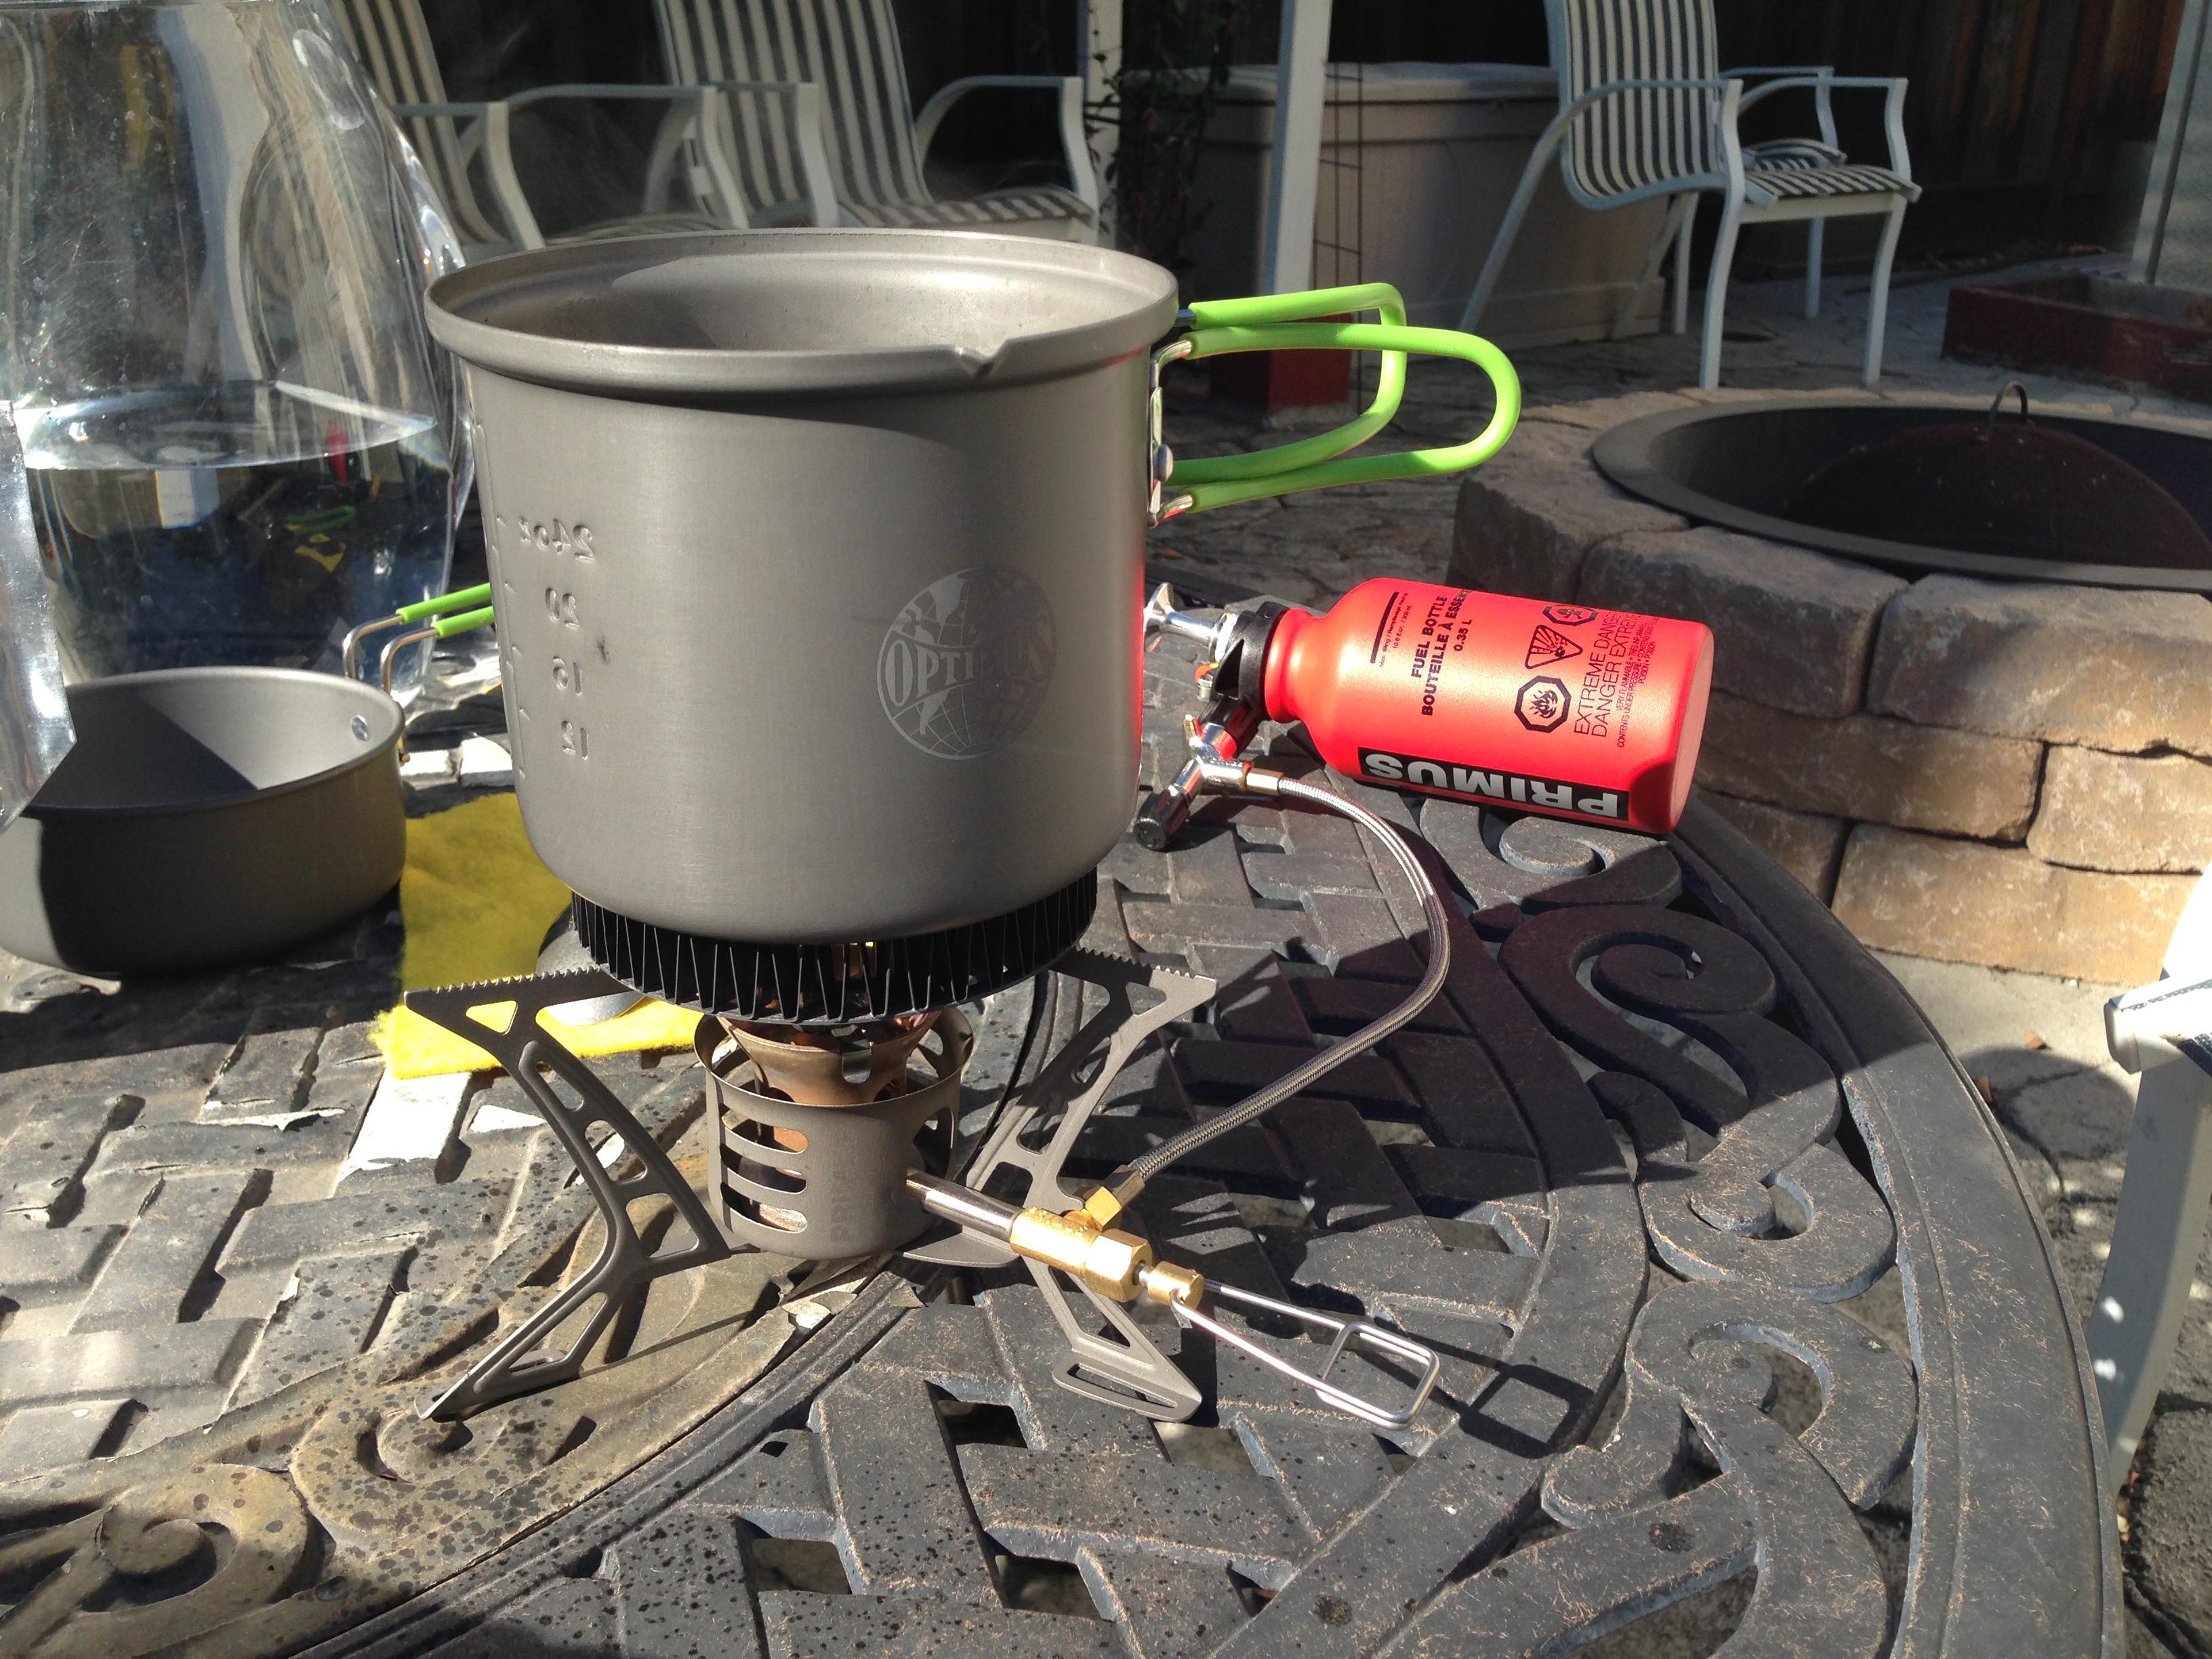 Optimus Terra Solo 2 Piece Aluminum Camping Backpacking Survival Mess Kit Set